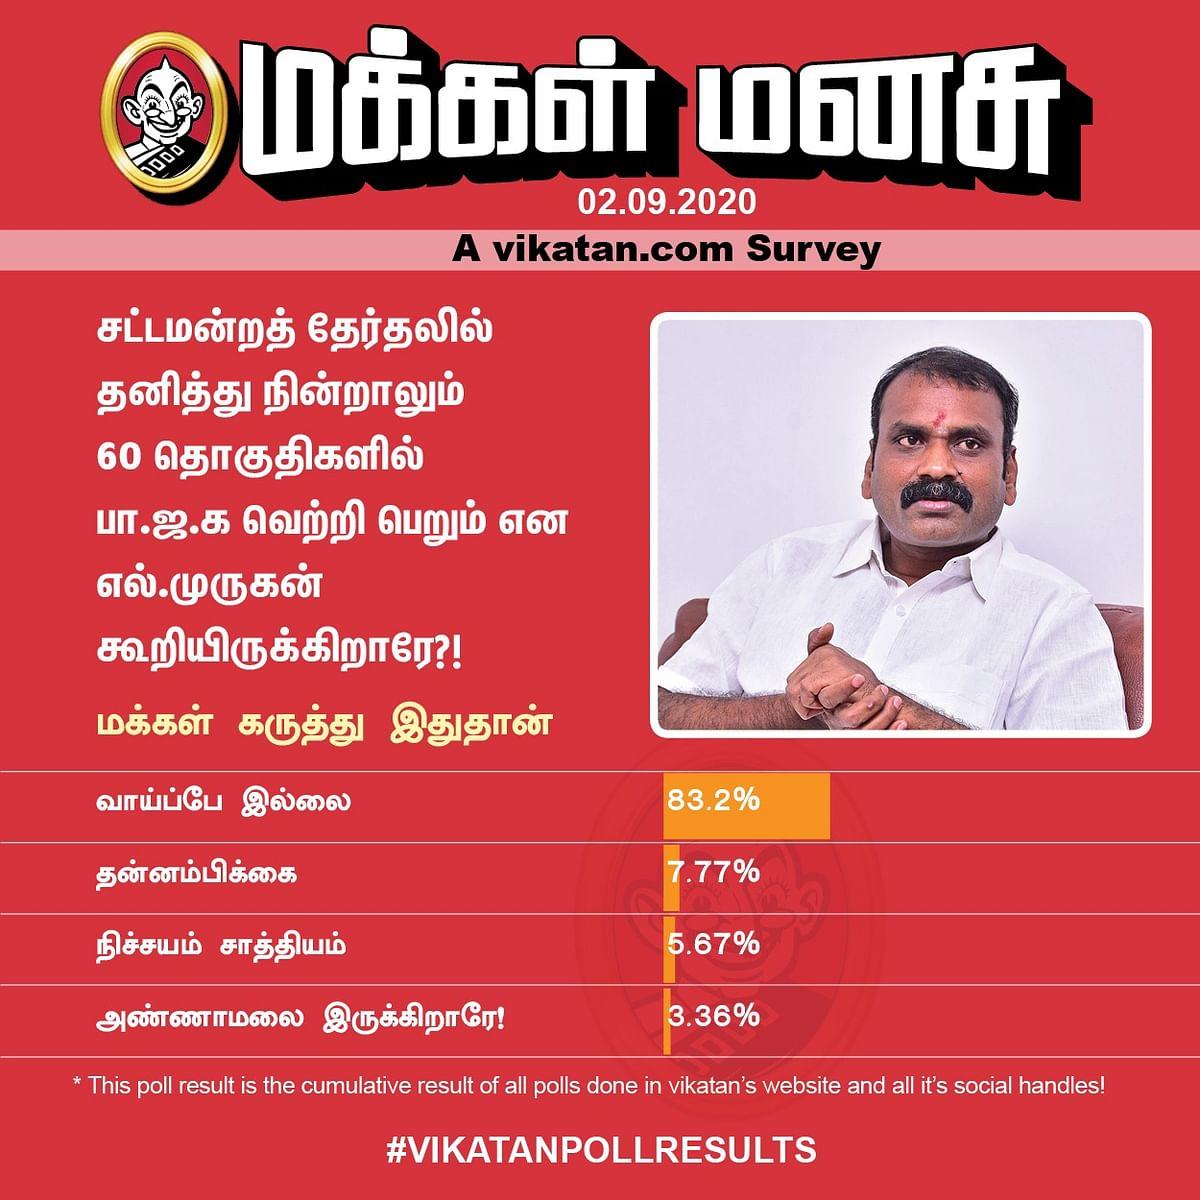 BJP | Vikatan Poll